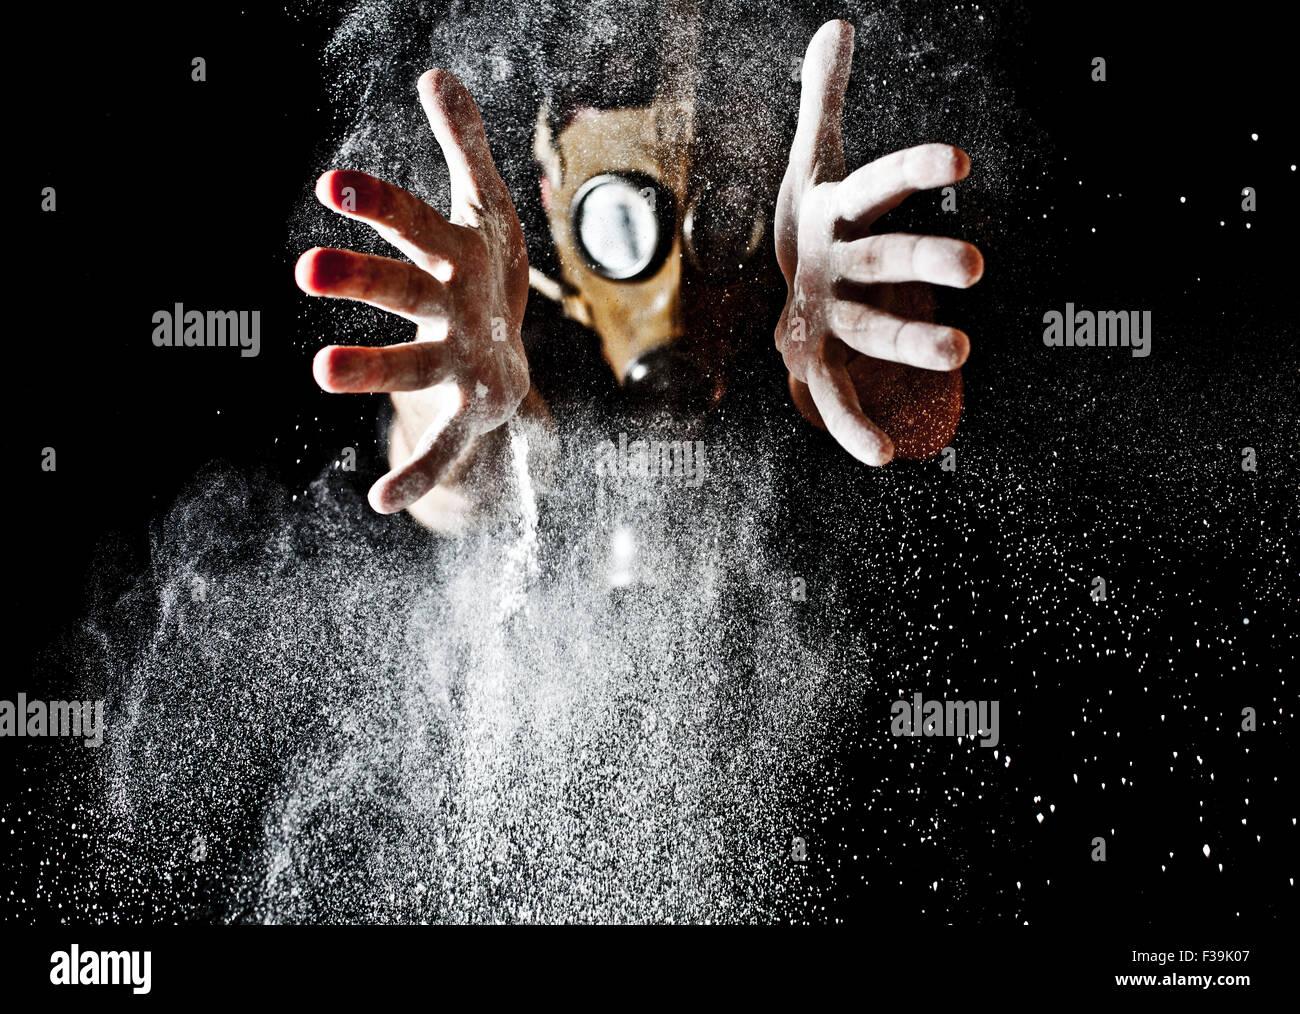 Man with gas mask throwing powder - Stock Image